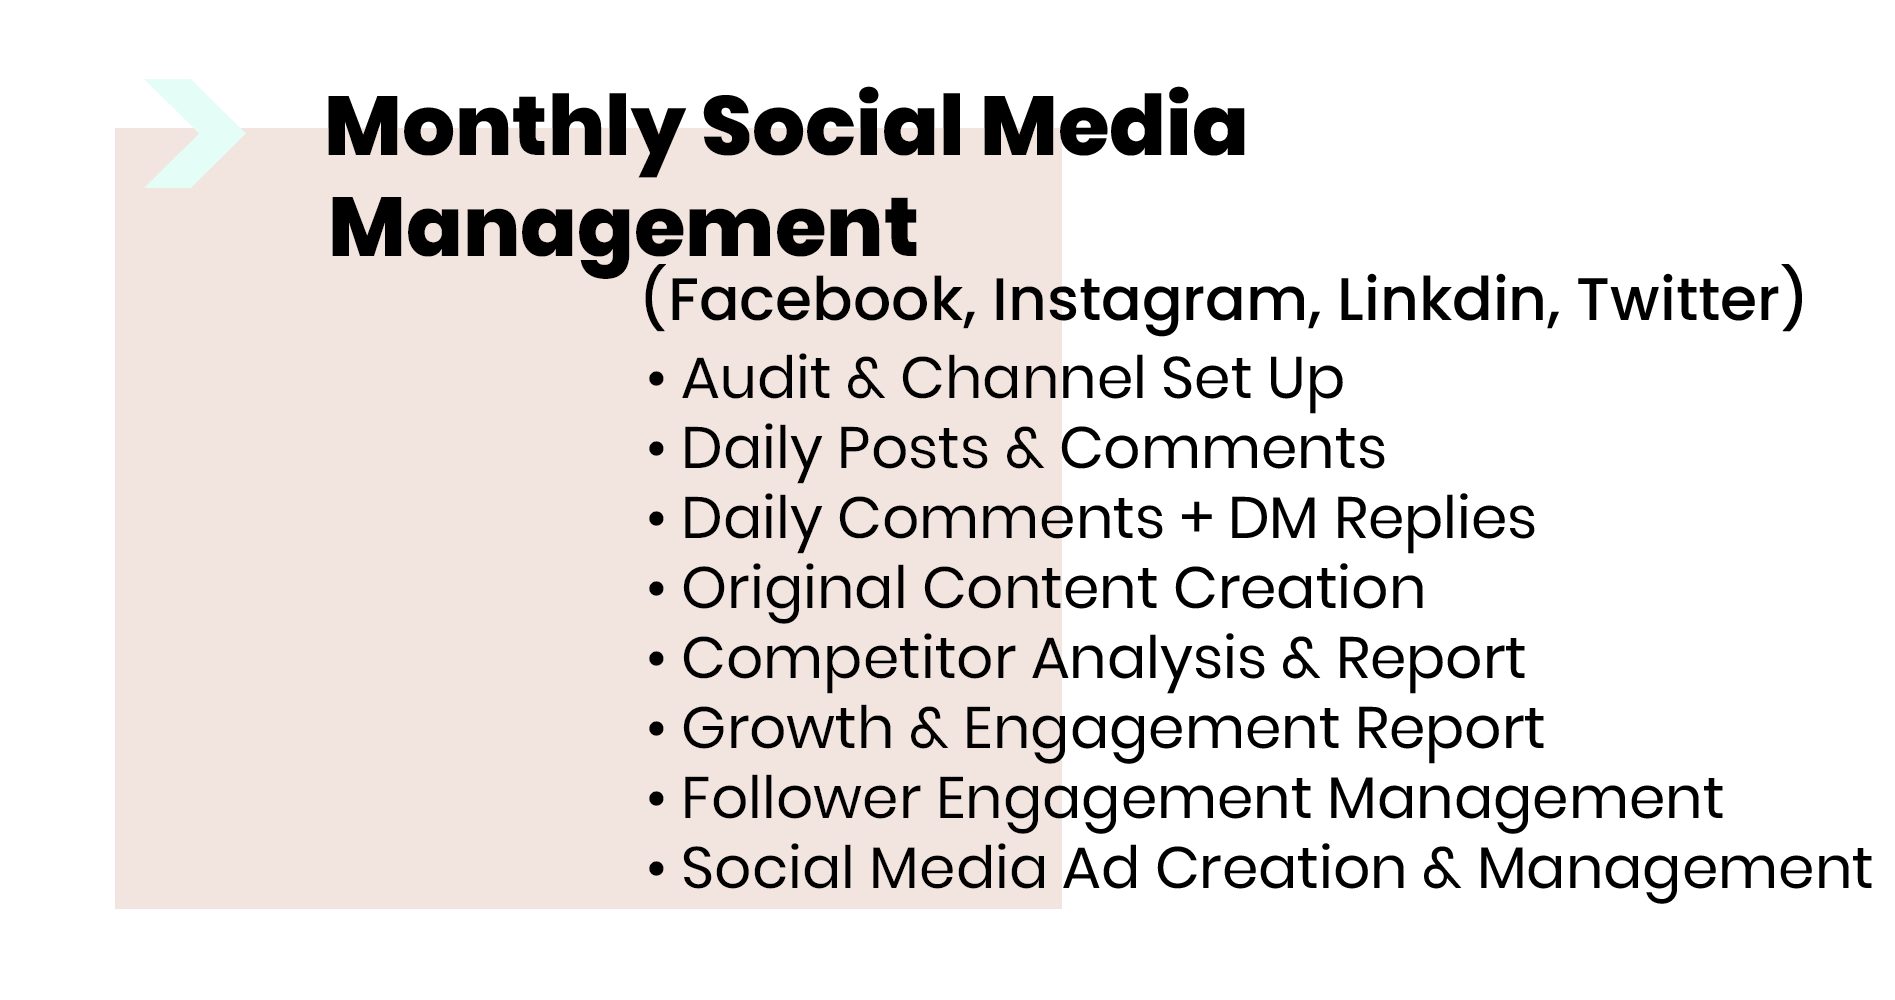 socialmediatype.png